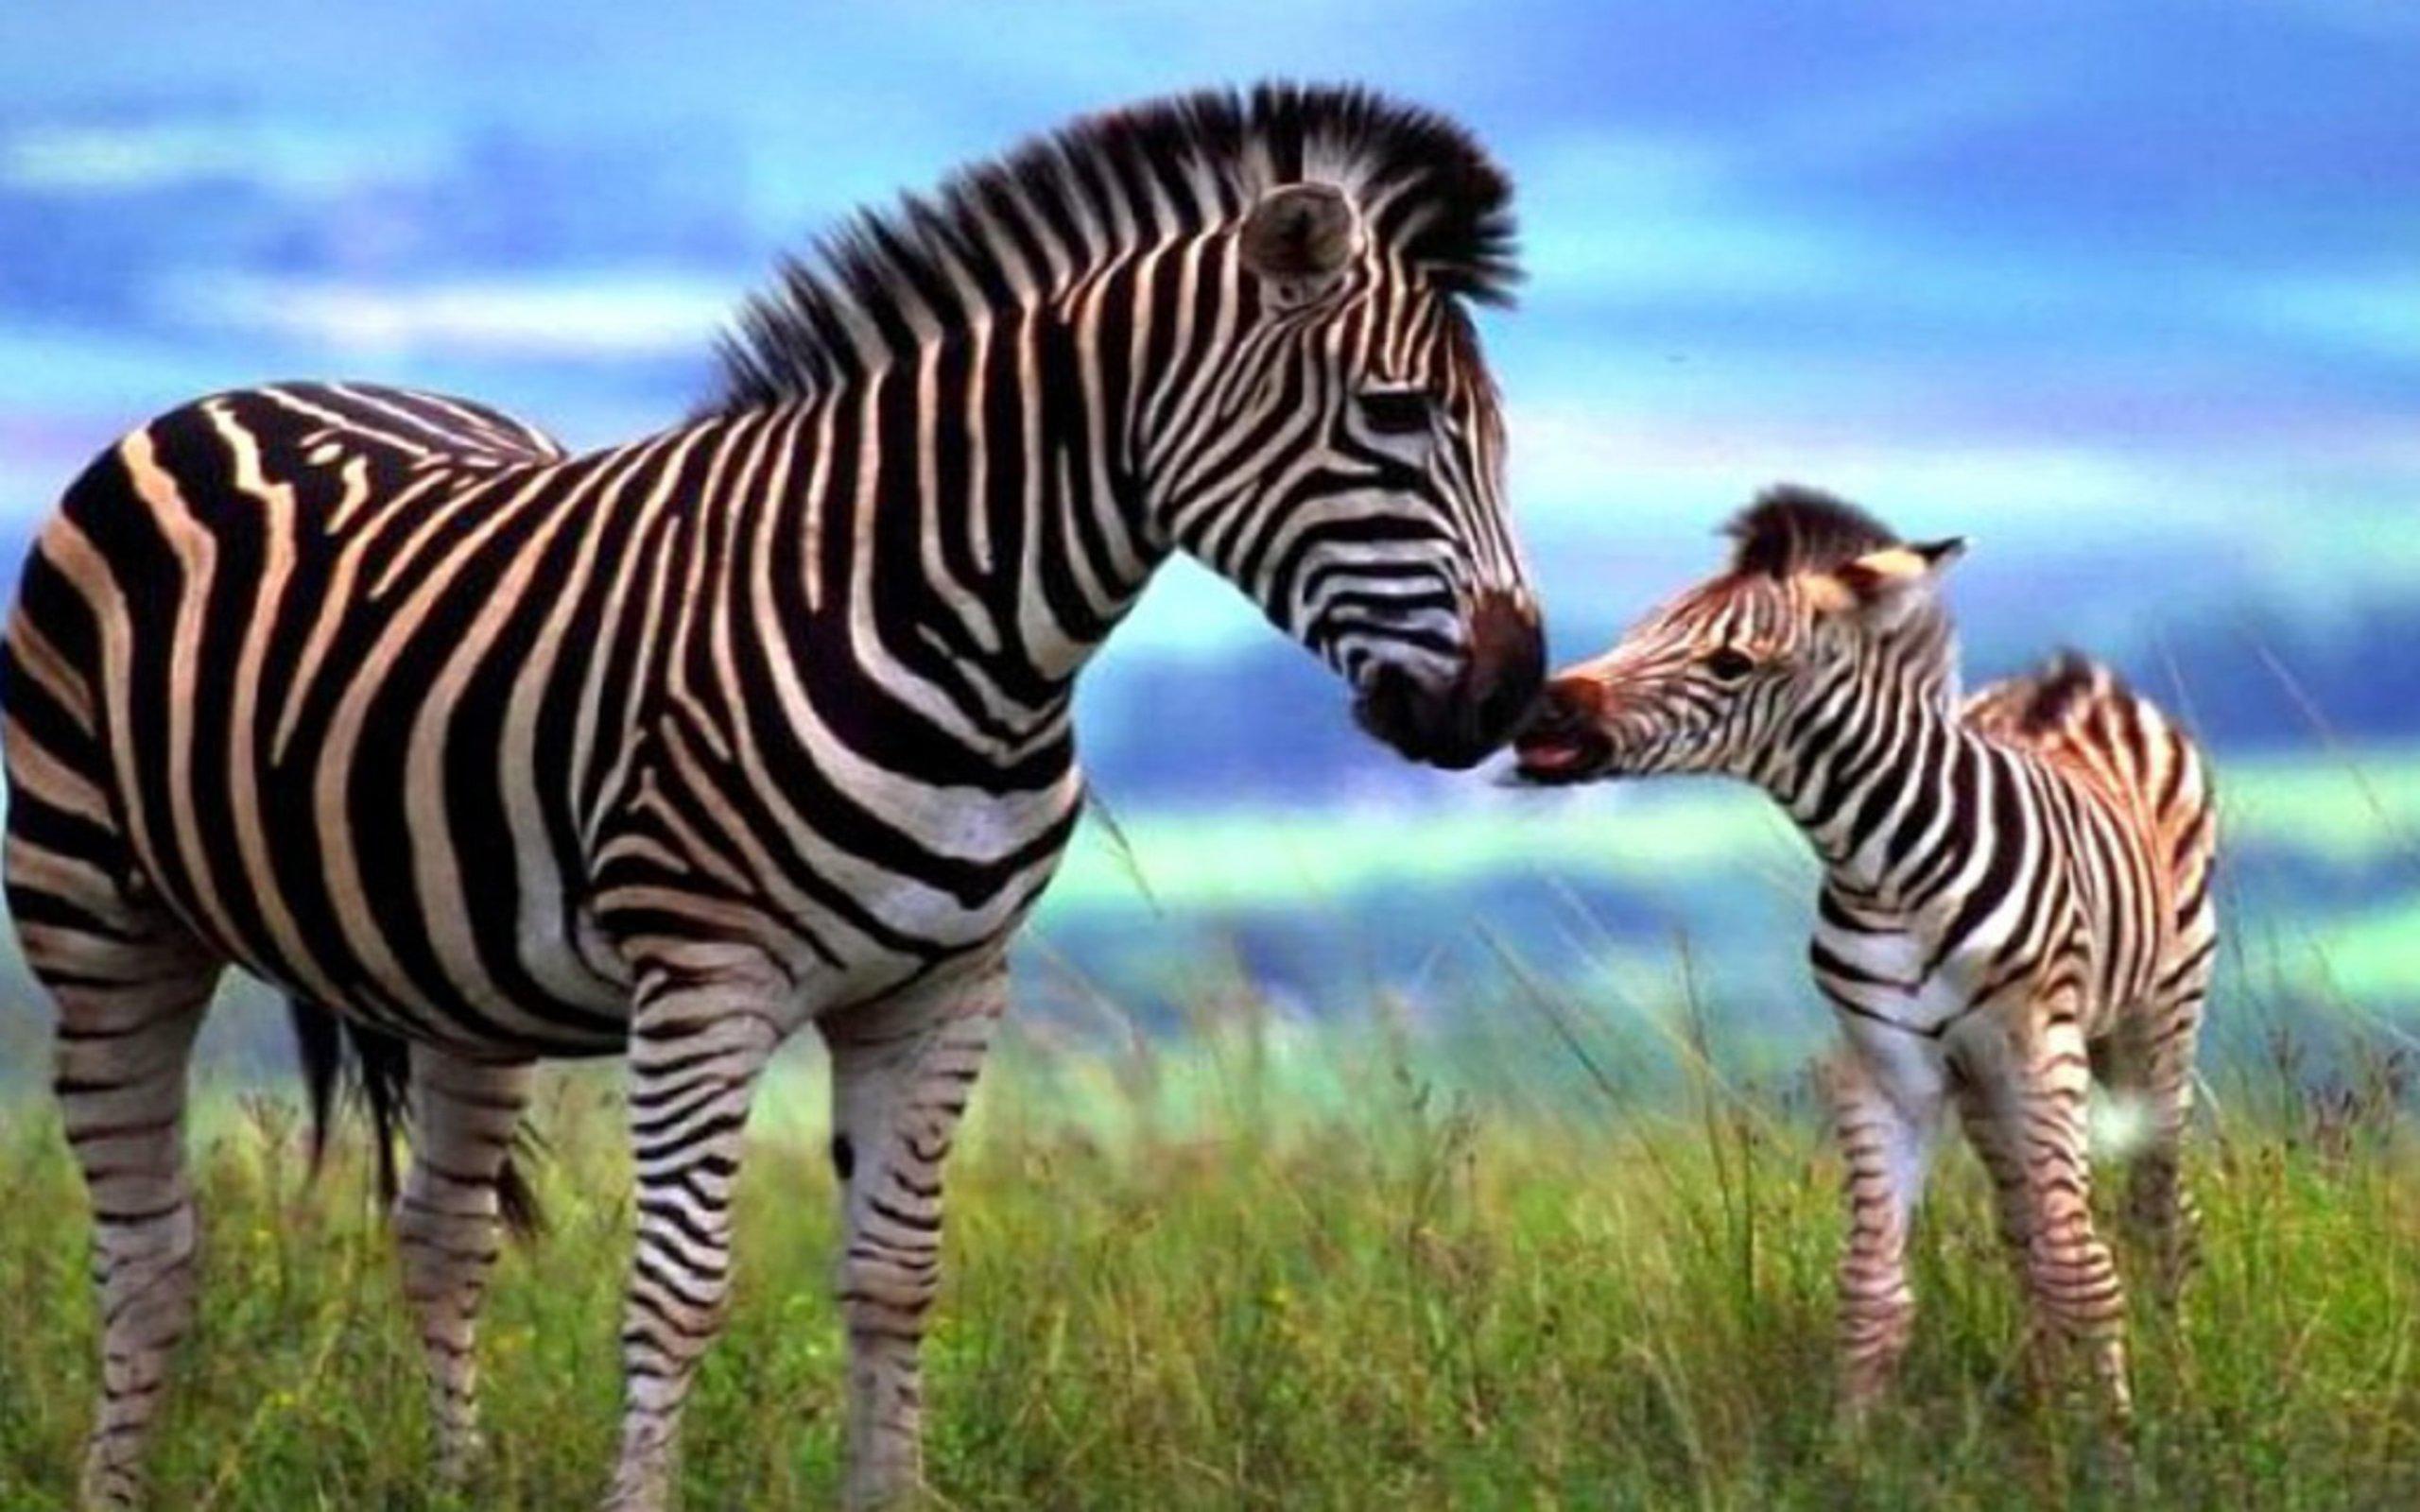 Zebra wallpaper 2560x1600 46808 for Zebra wallpaper